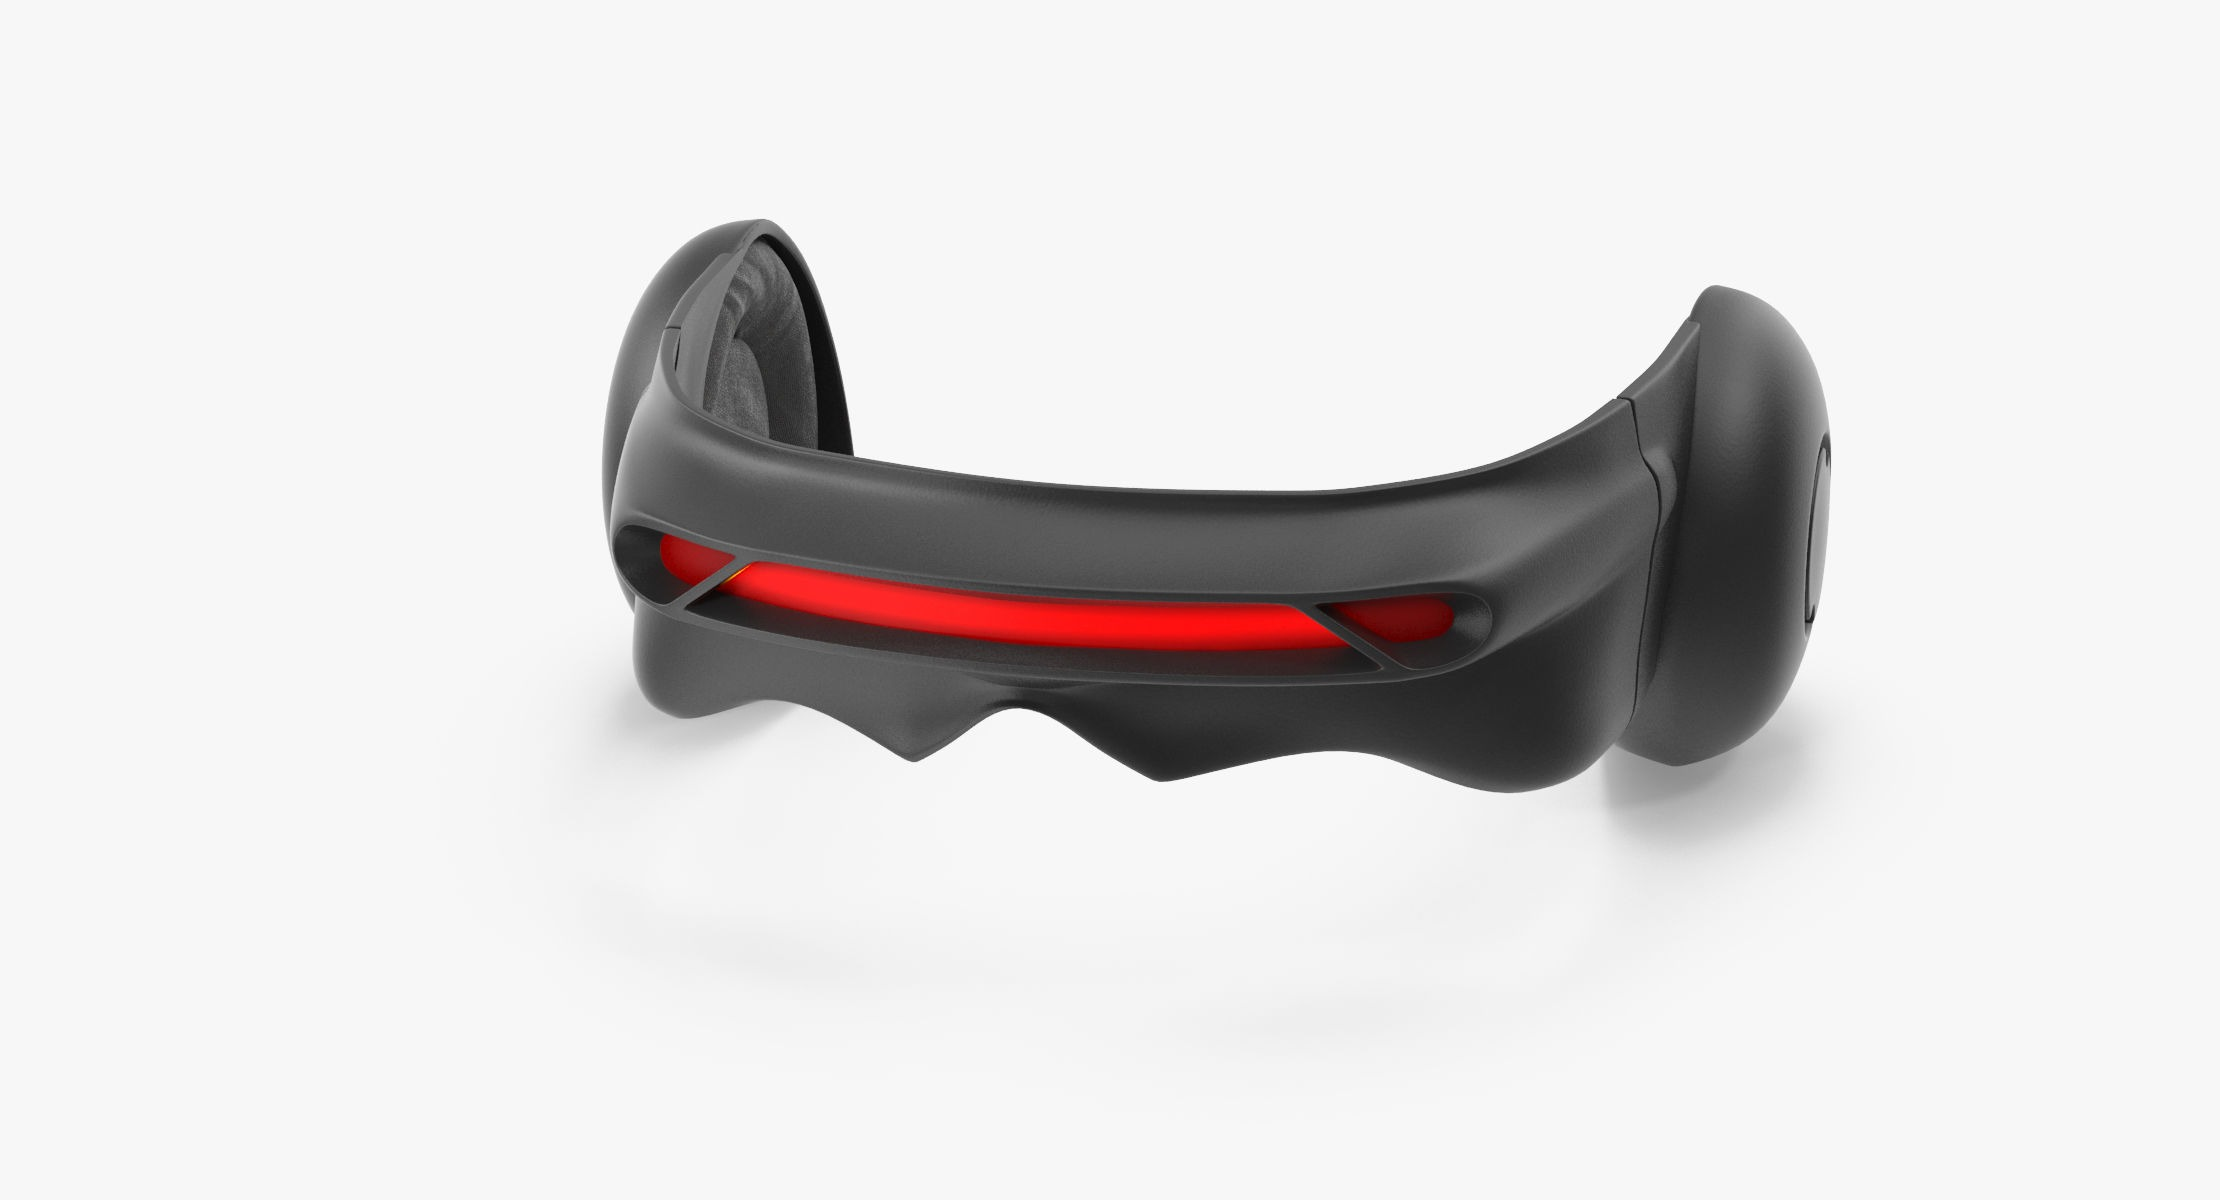 Cyclops Visor Illuminated - reel 1